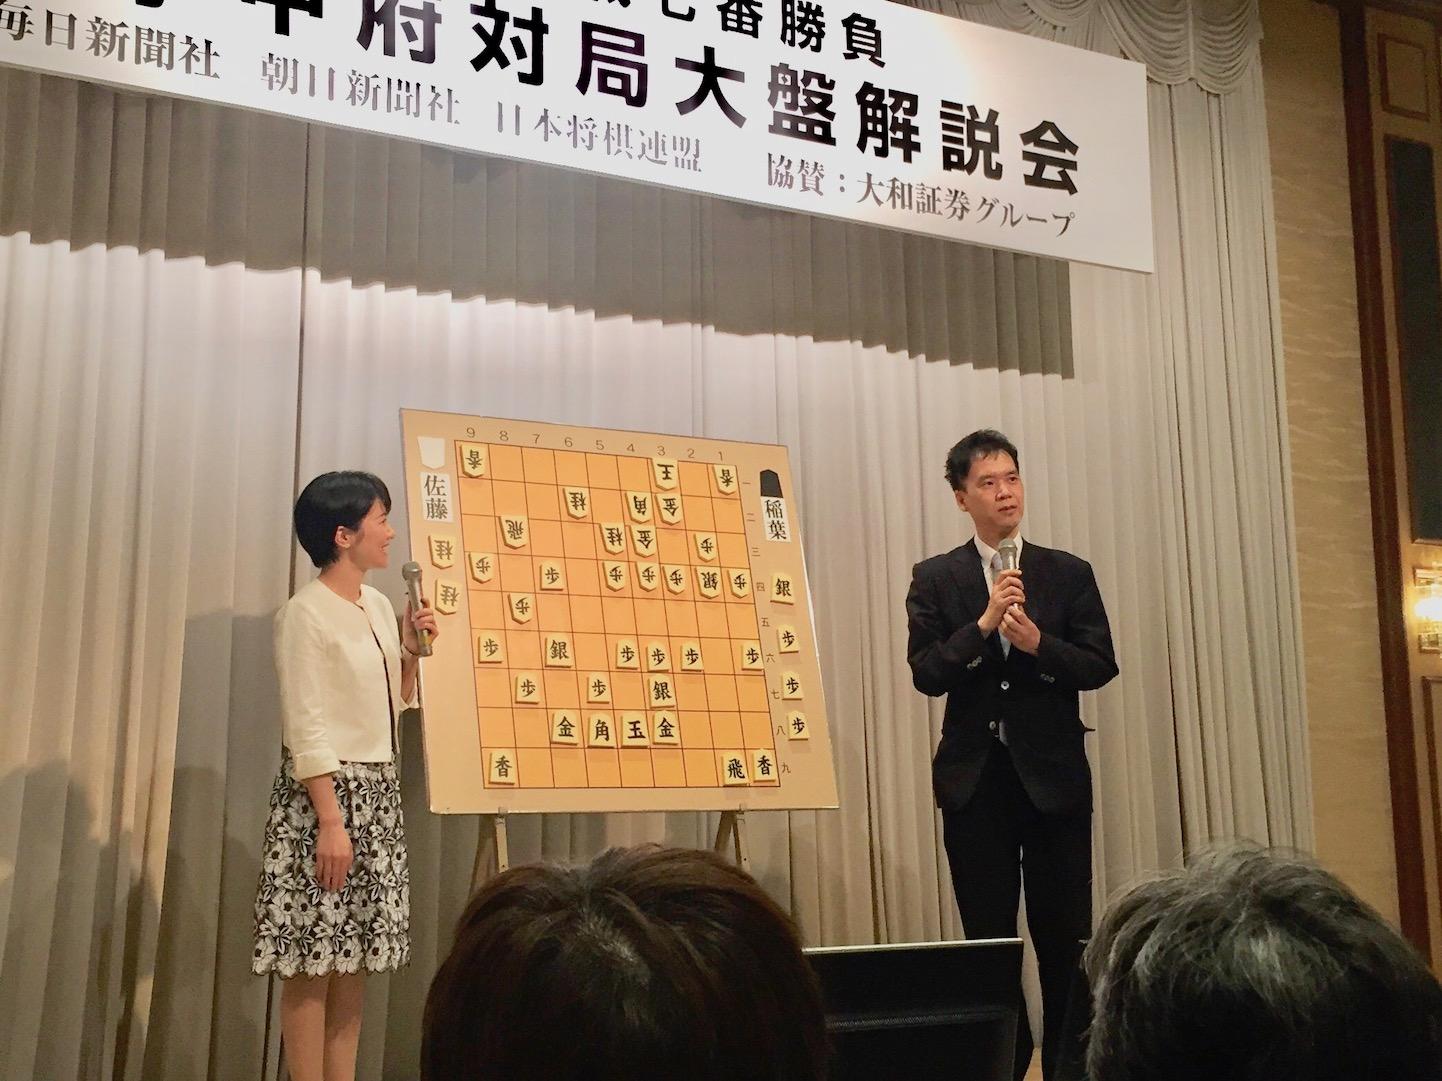 斉藤慎太郎王座と畠山鎮七段の対談